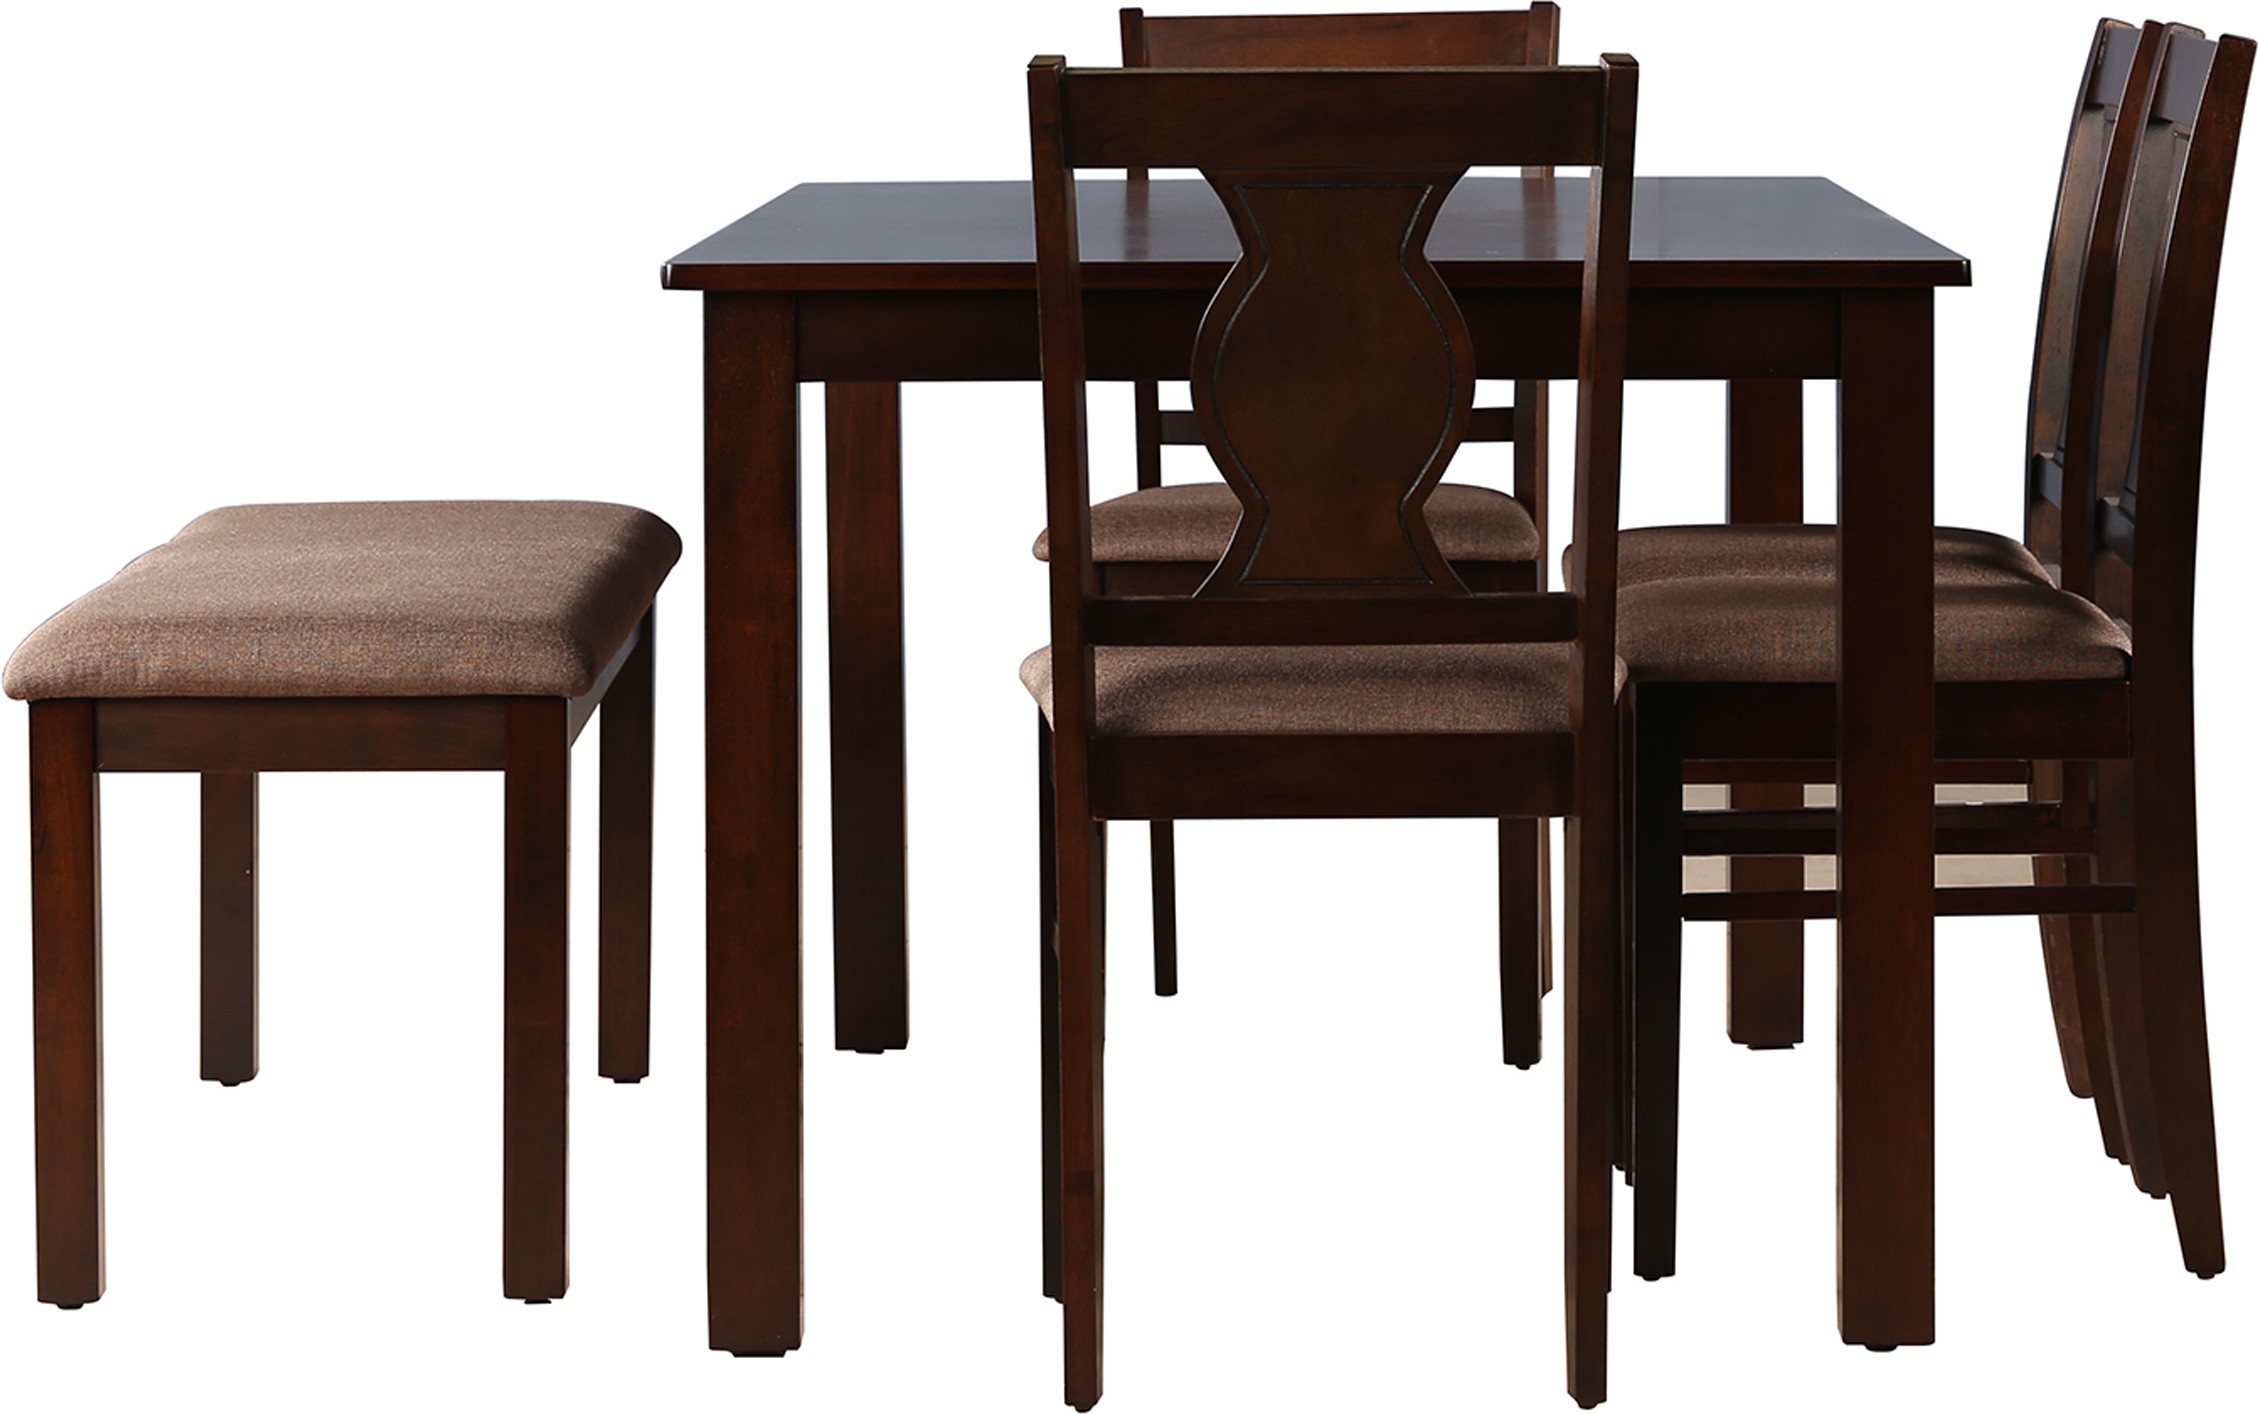 461d923e2fa View HomeTown Artois Solid Wood Dining Set(Finish Color - Dark Walnut)  Furniture (